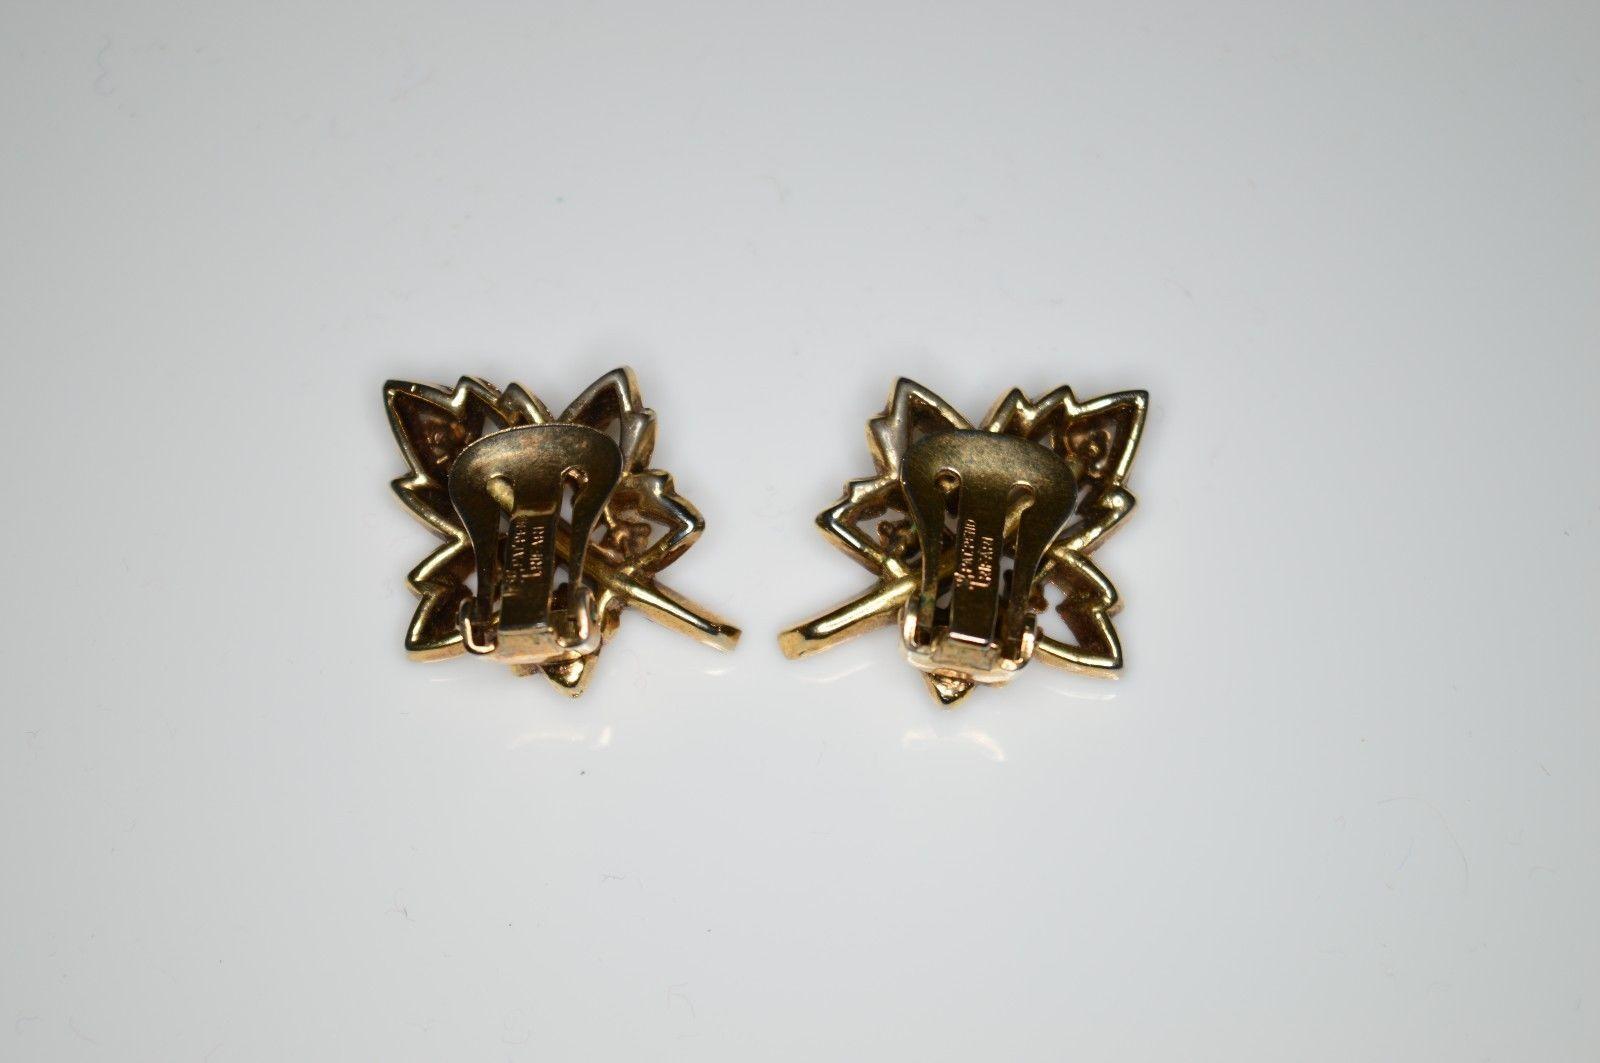 VTG 1950'S TRIFARI PAT PEND Alfred Philippe Maple Leaf Clear Rhinestone Earrings